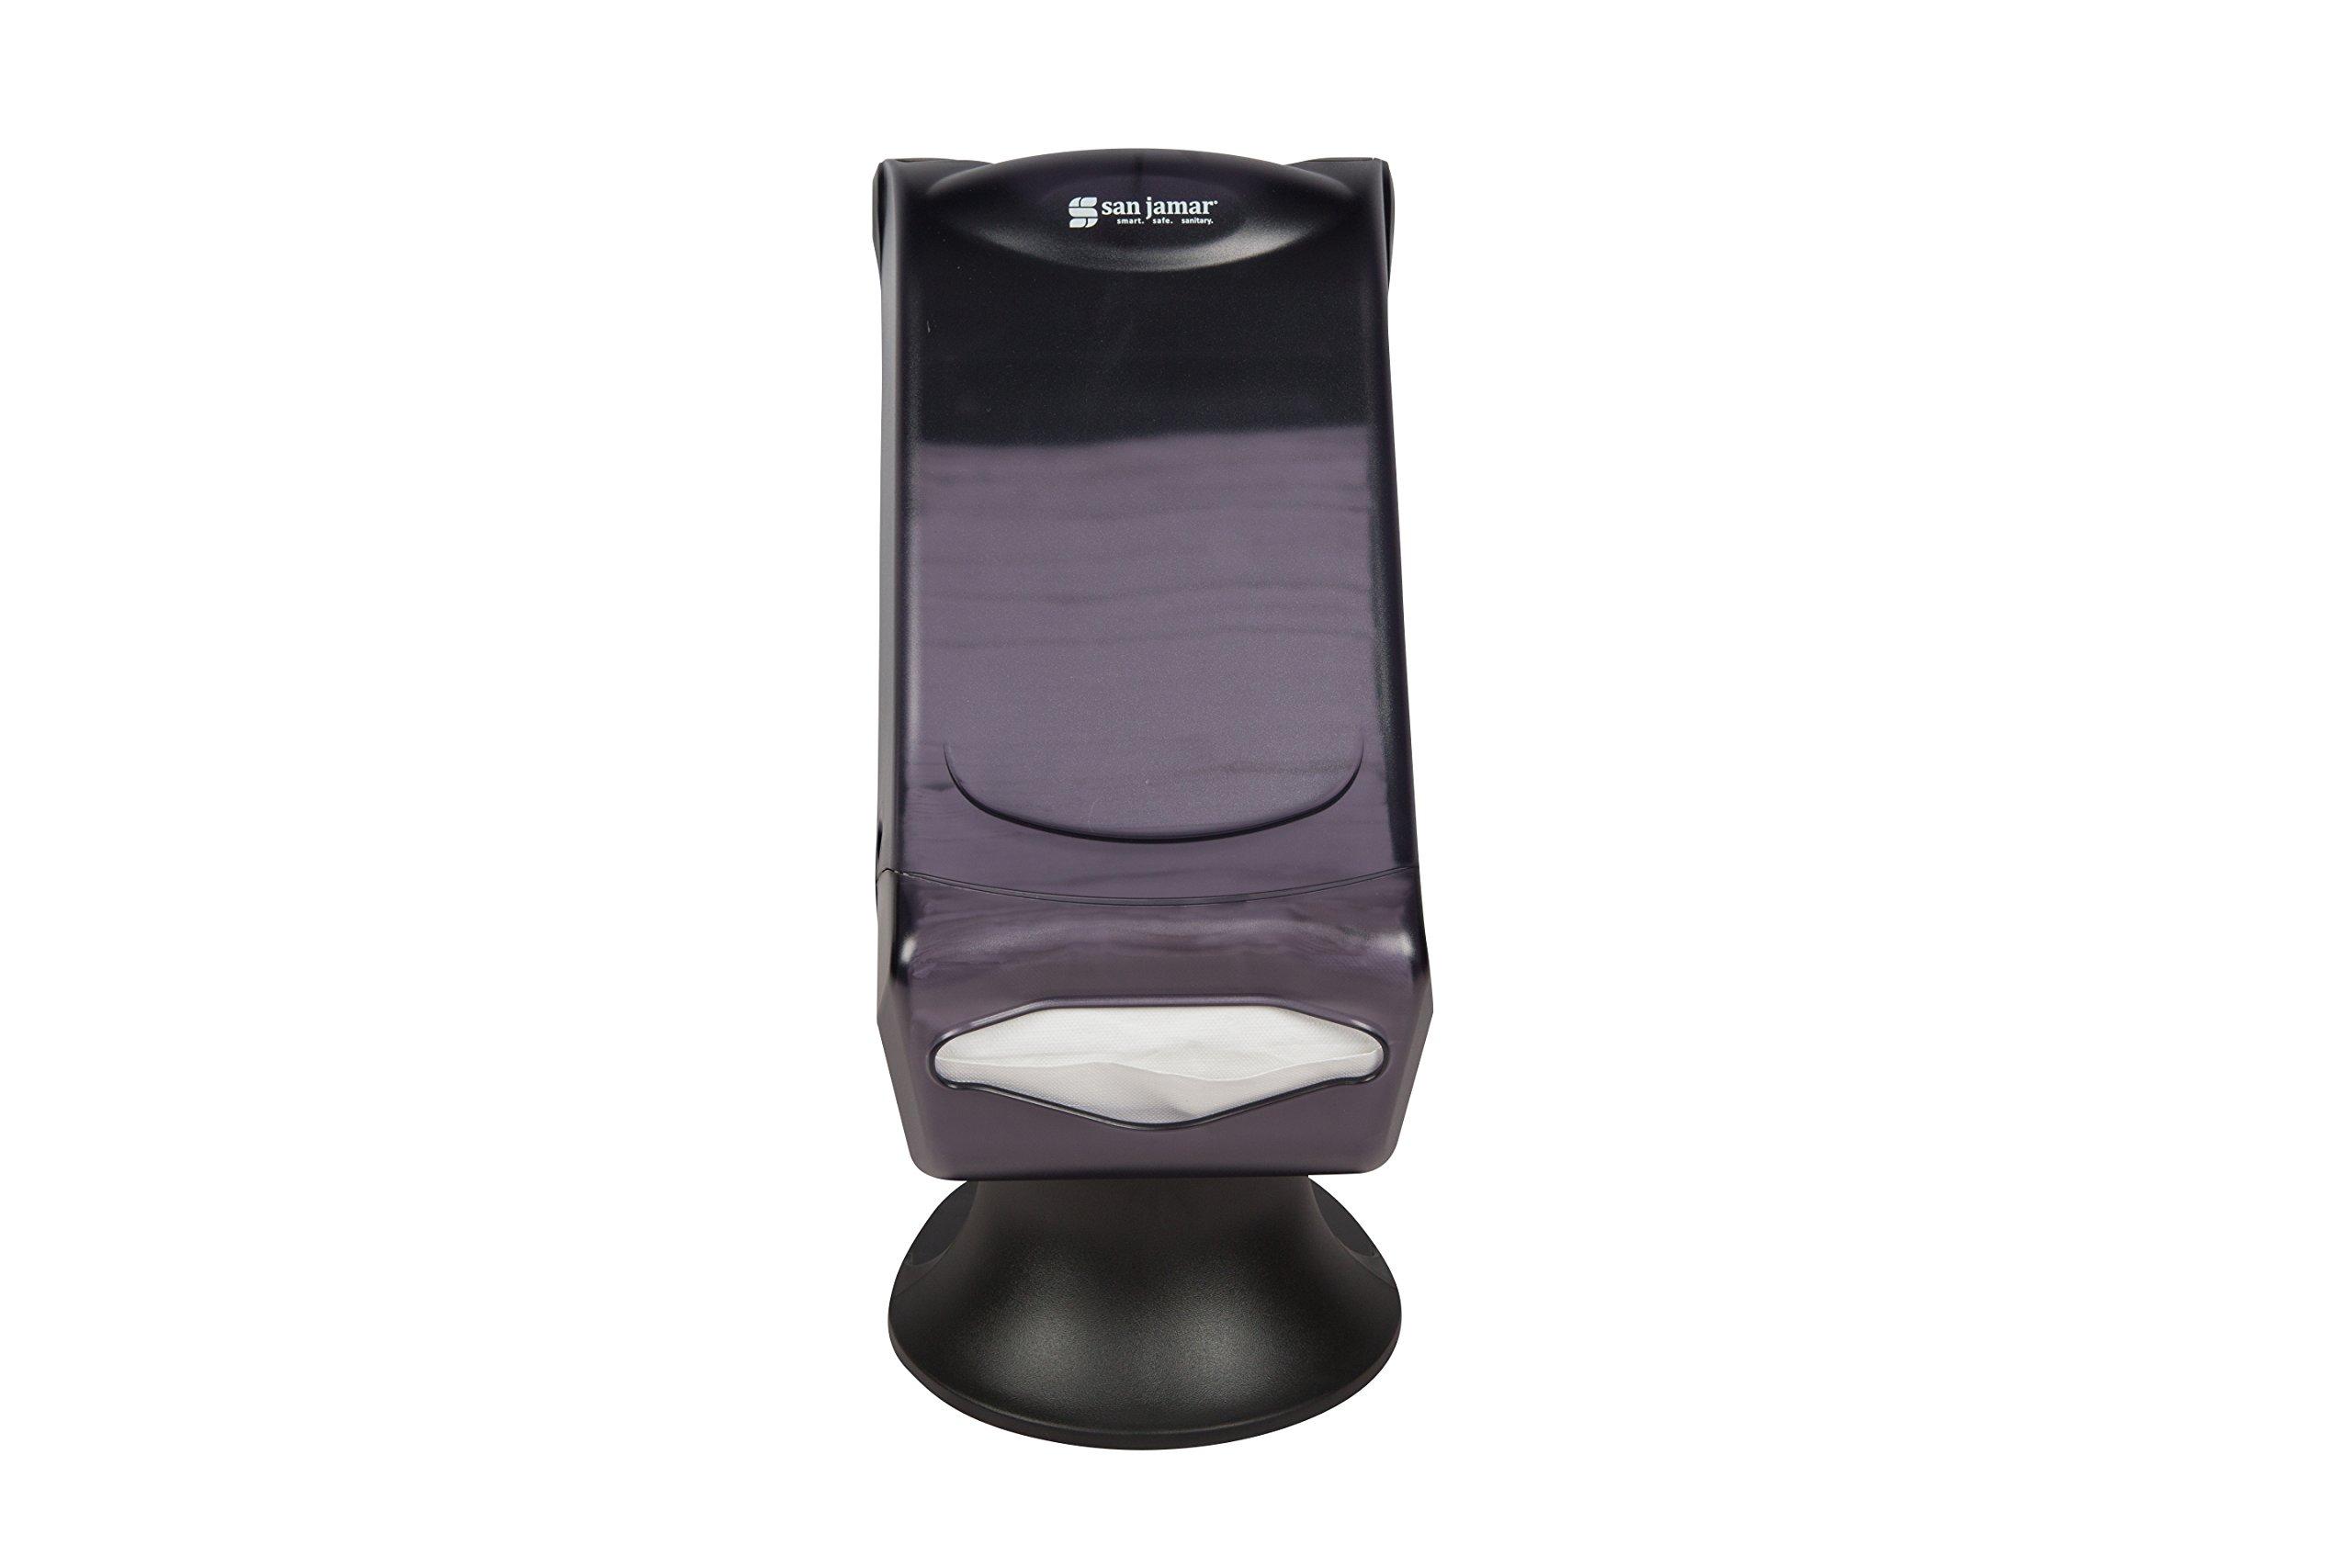 San Jamar H5005S Venue Fullfold Control Napkin Dispenser with Stand, 500 Capacity, 8'' Width x 17-1/2'' Height x 13'' Depth, Black Pearl